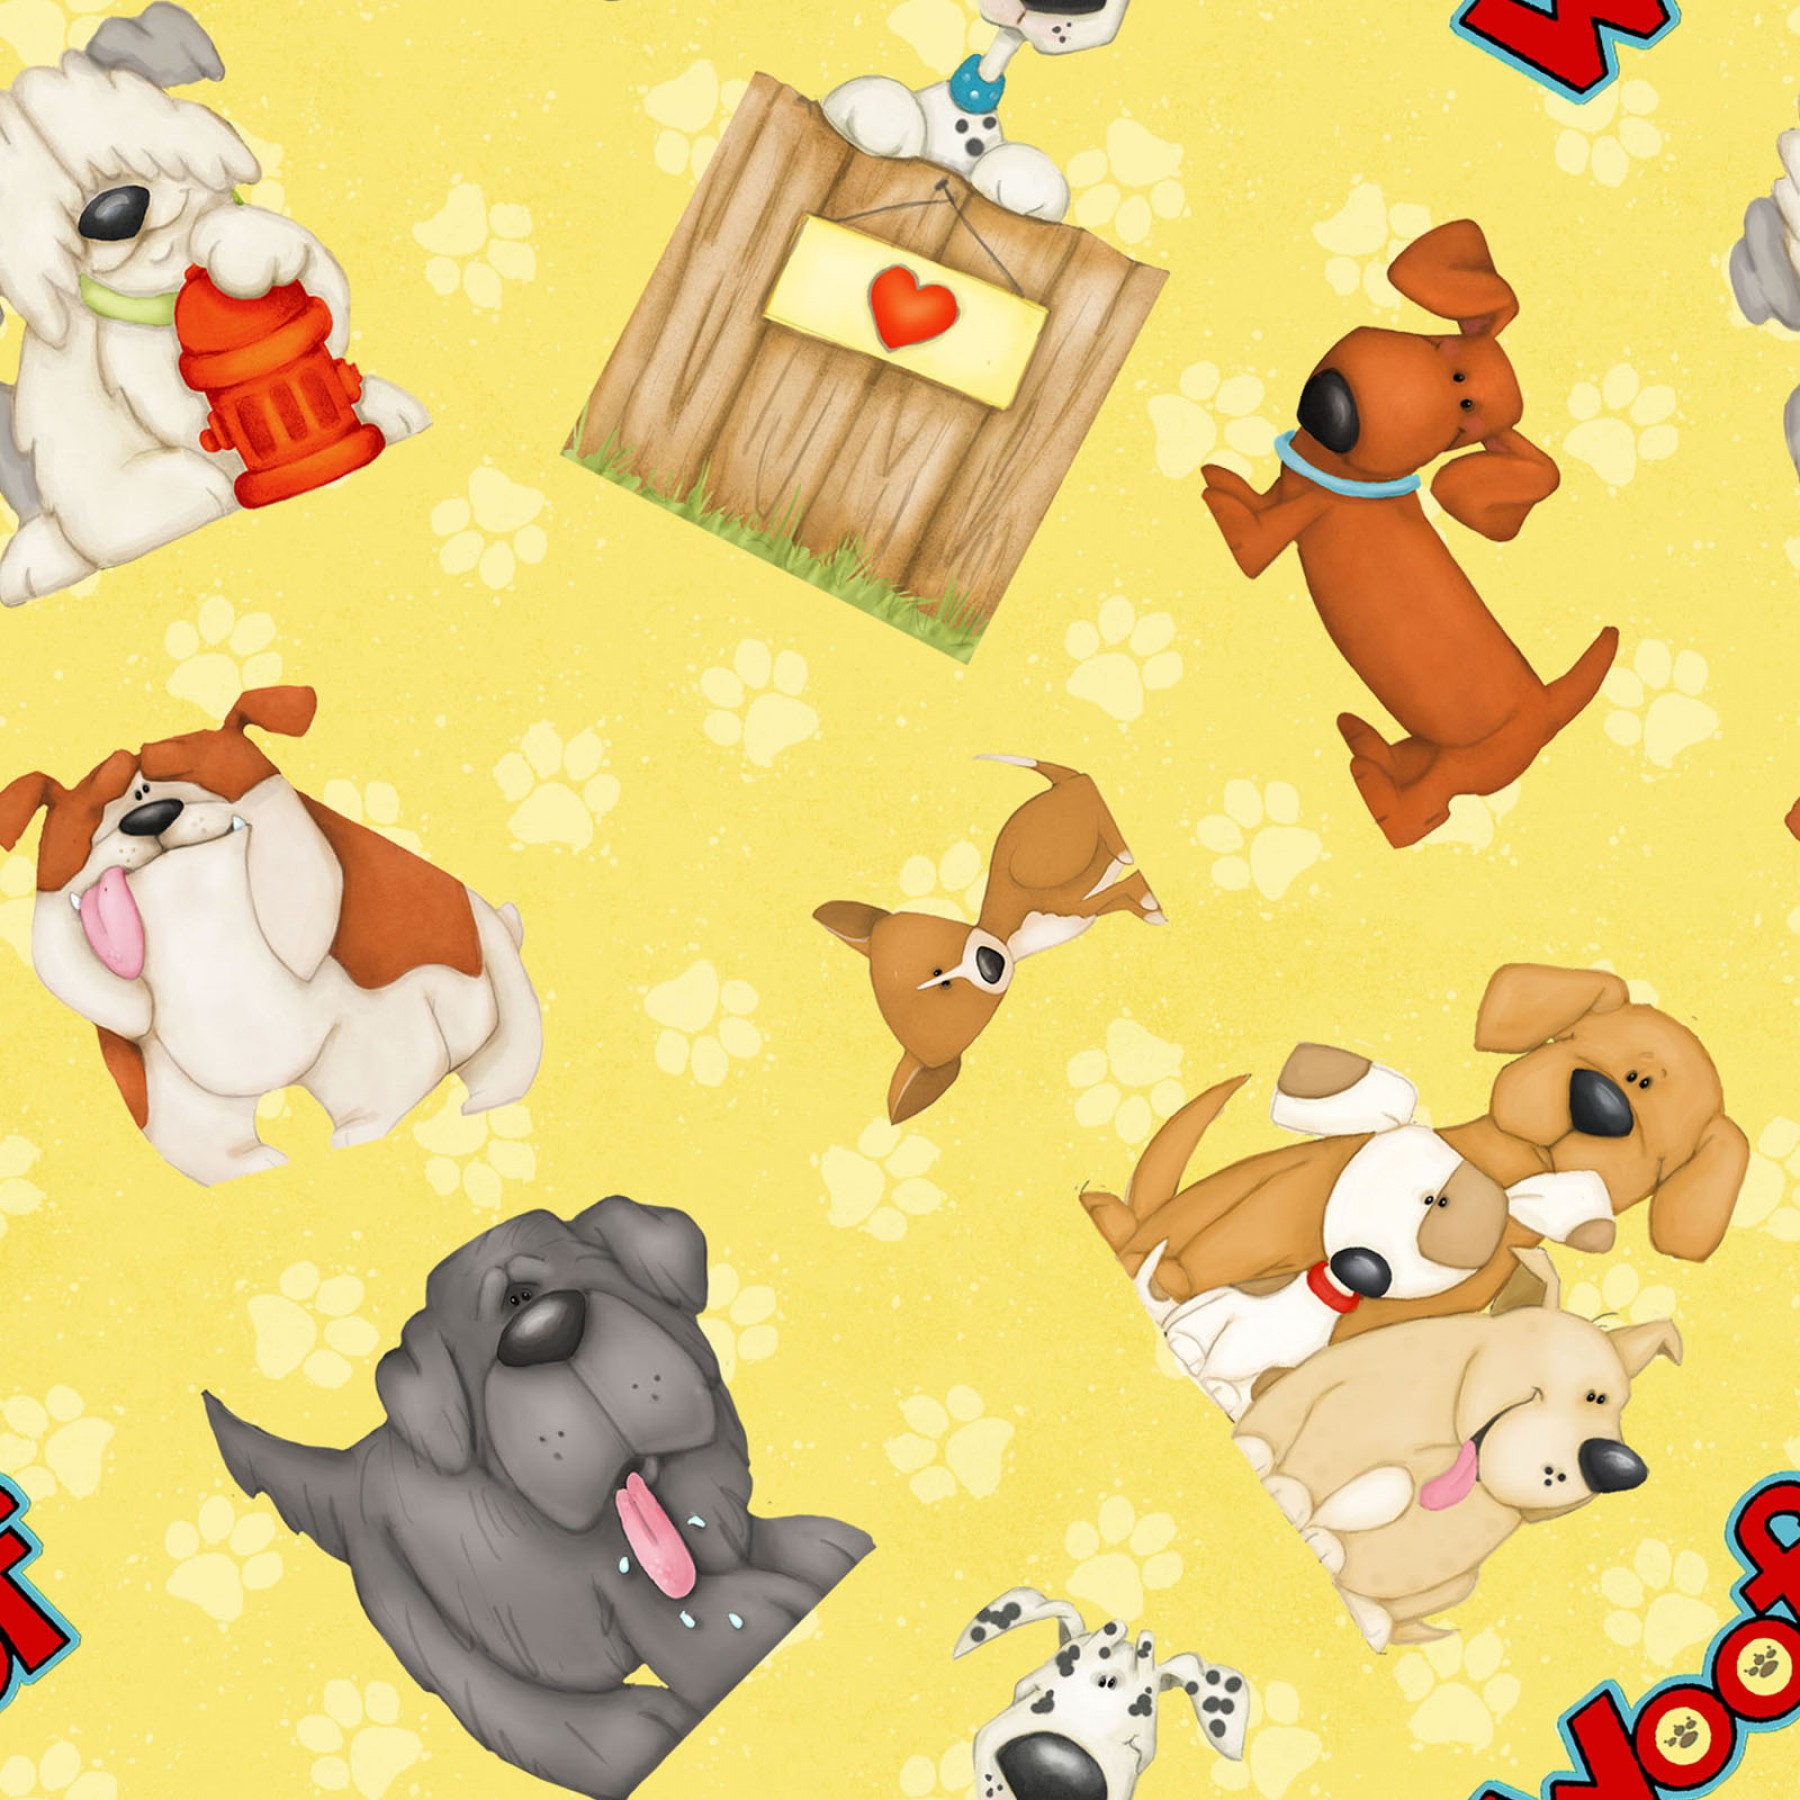 dog and suds - HD1800×1800